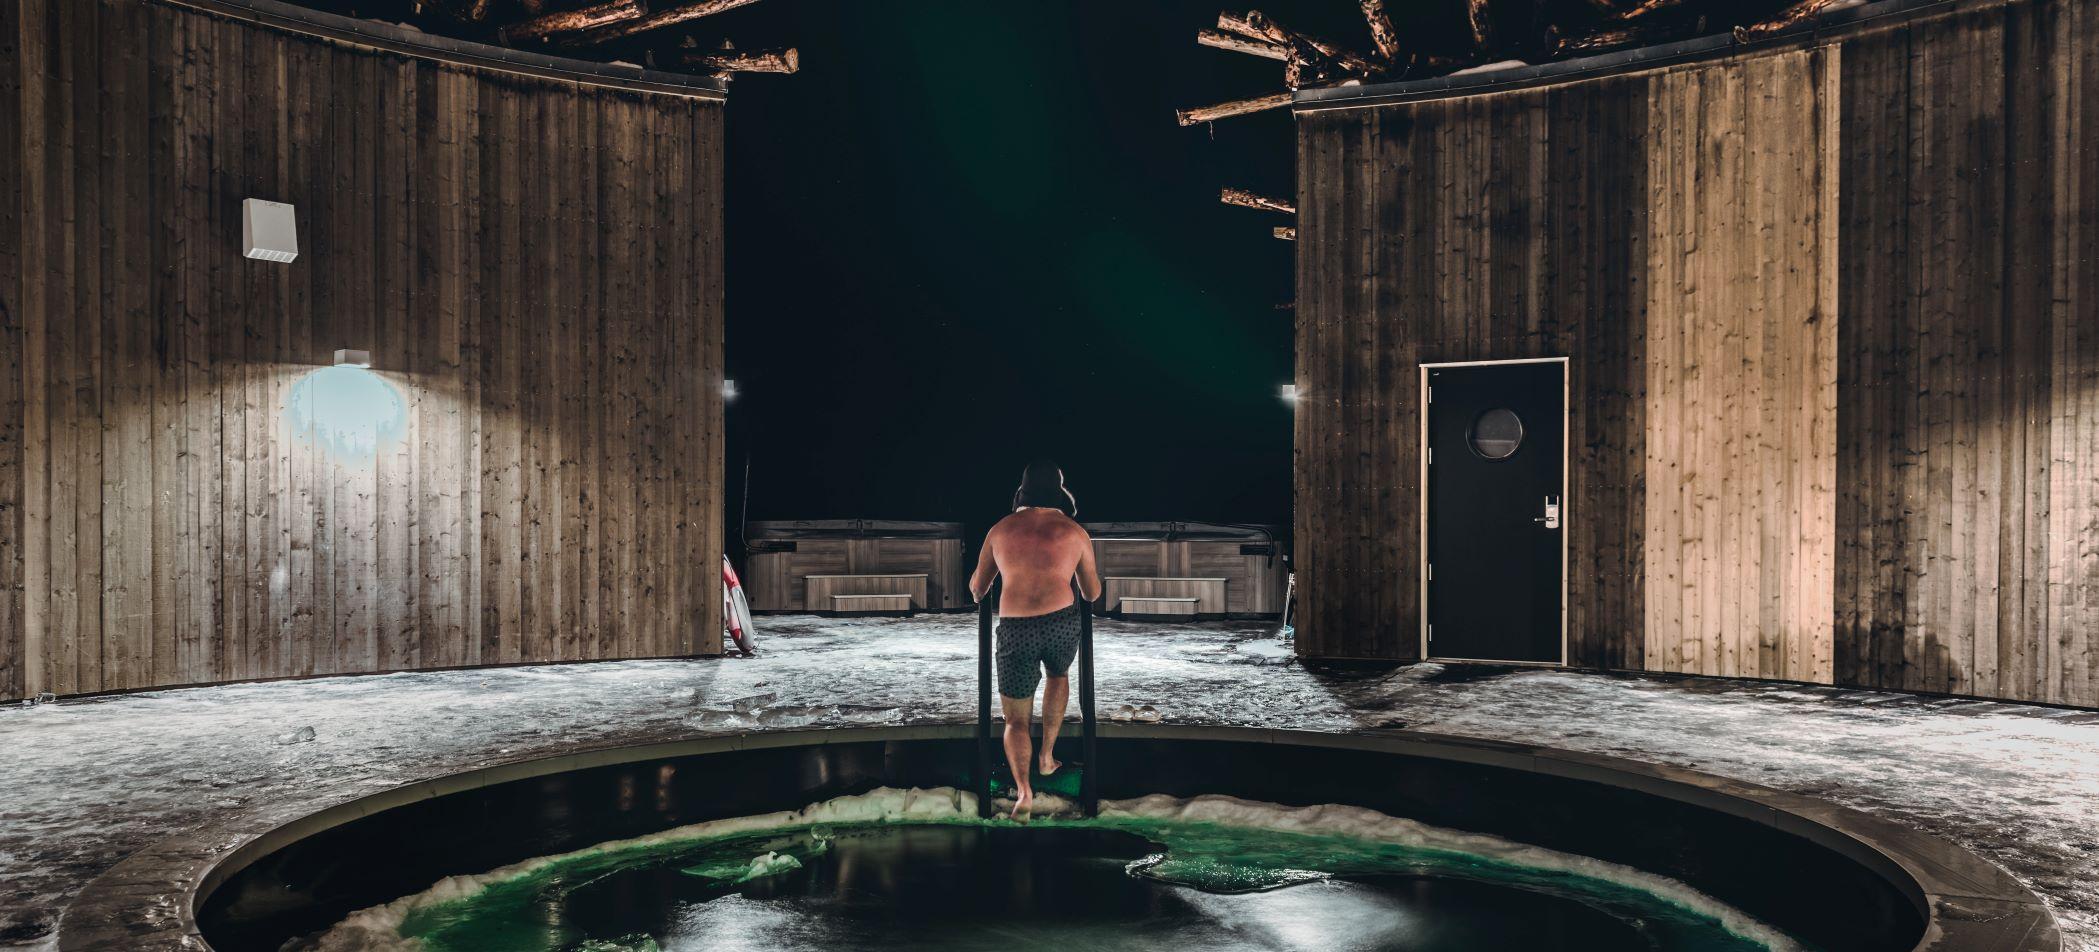 arctic-bath-ice-pool